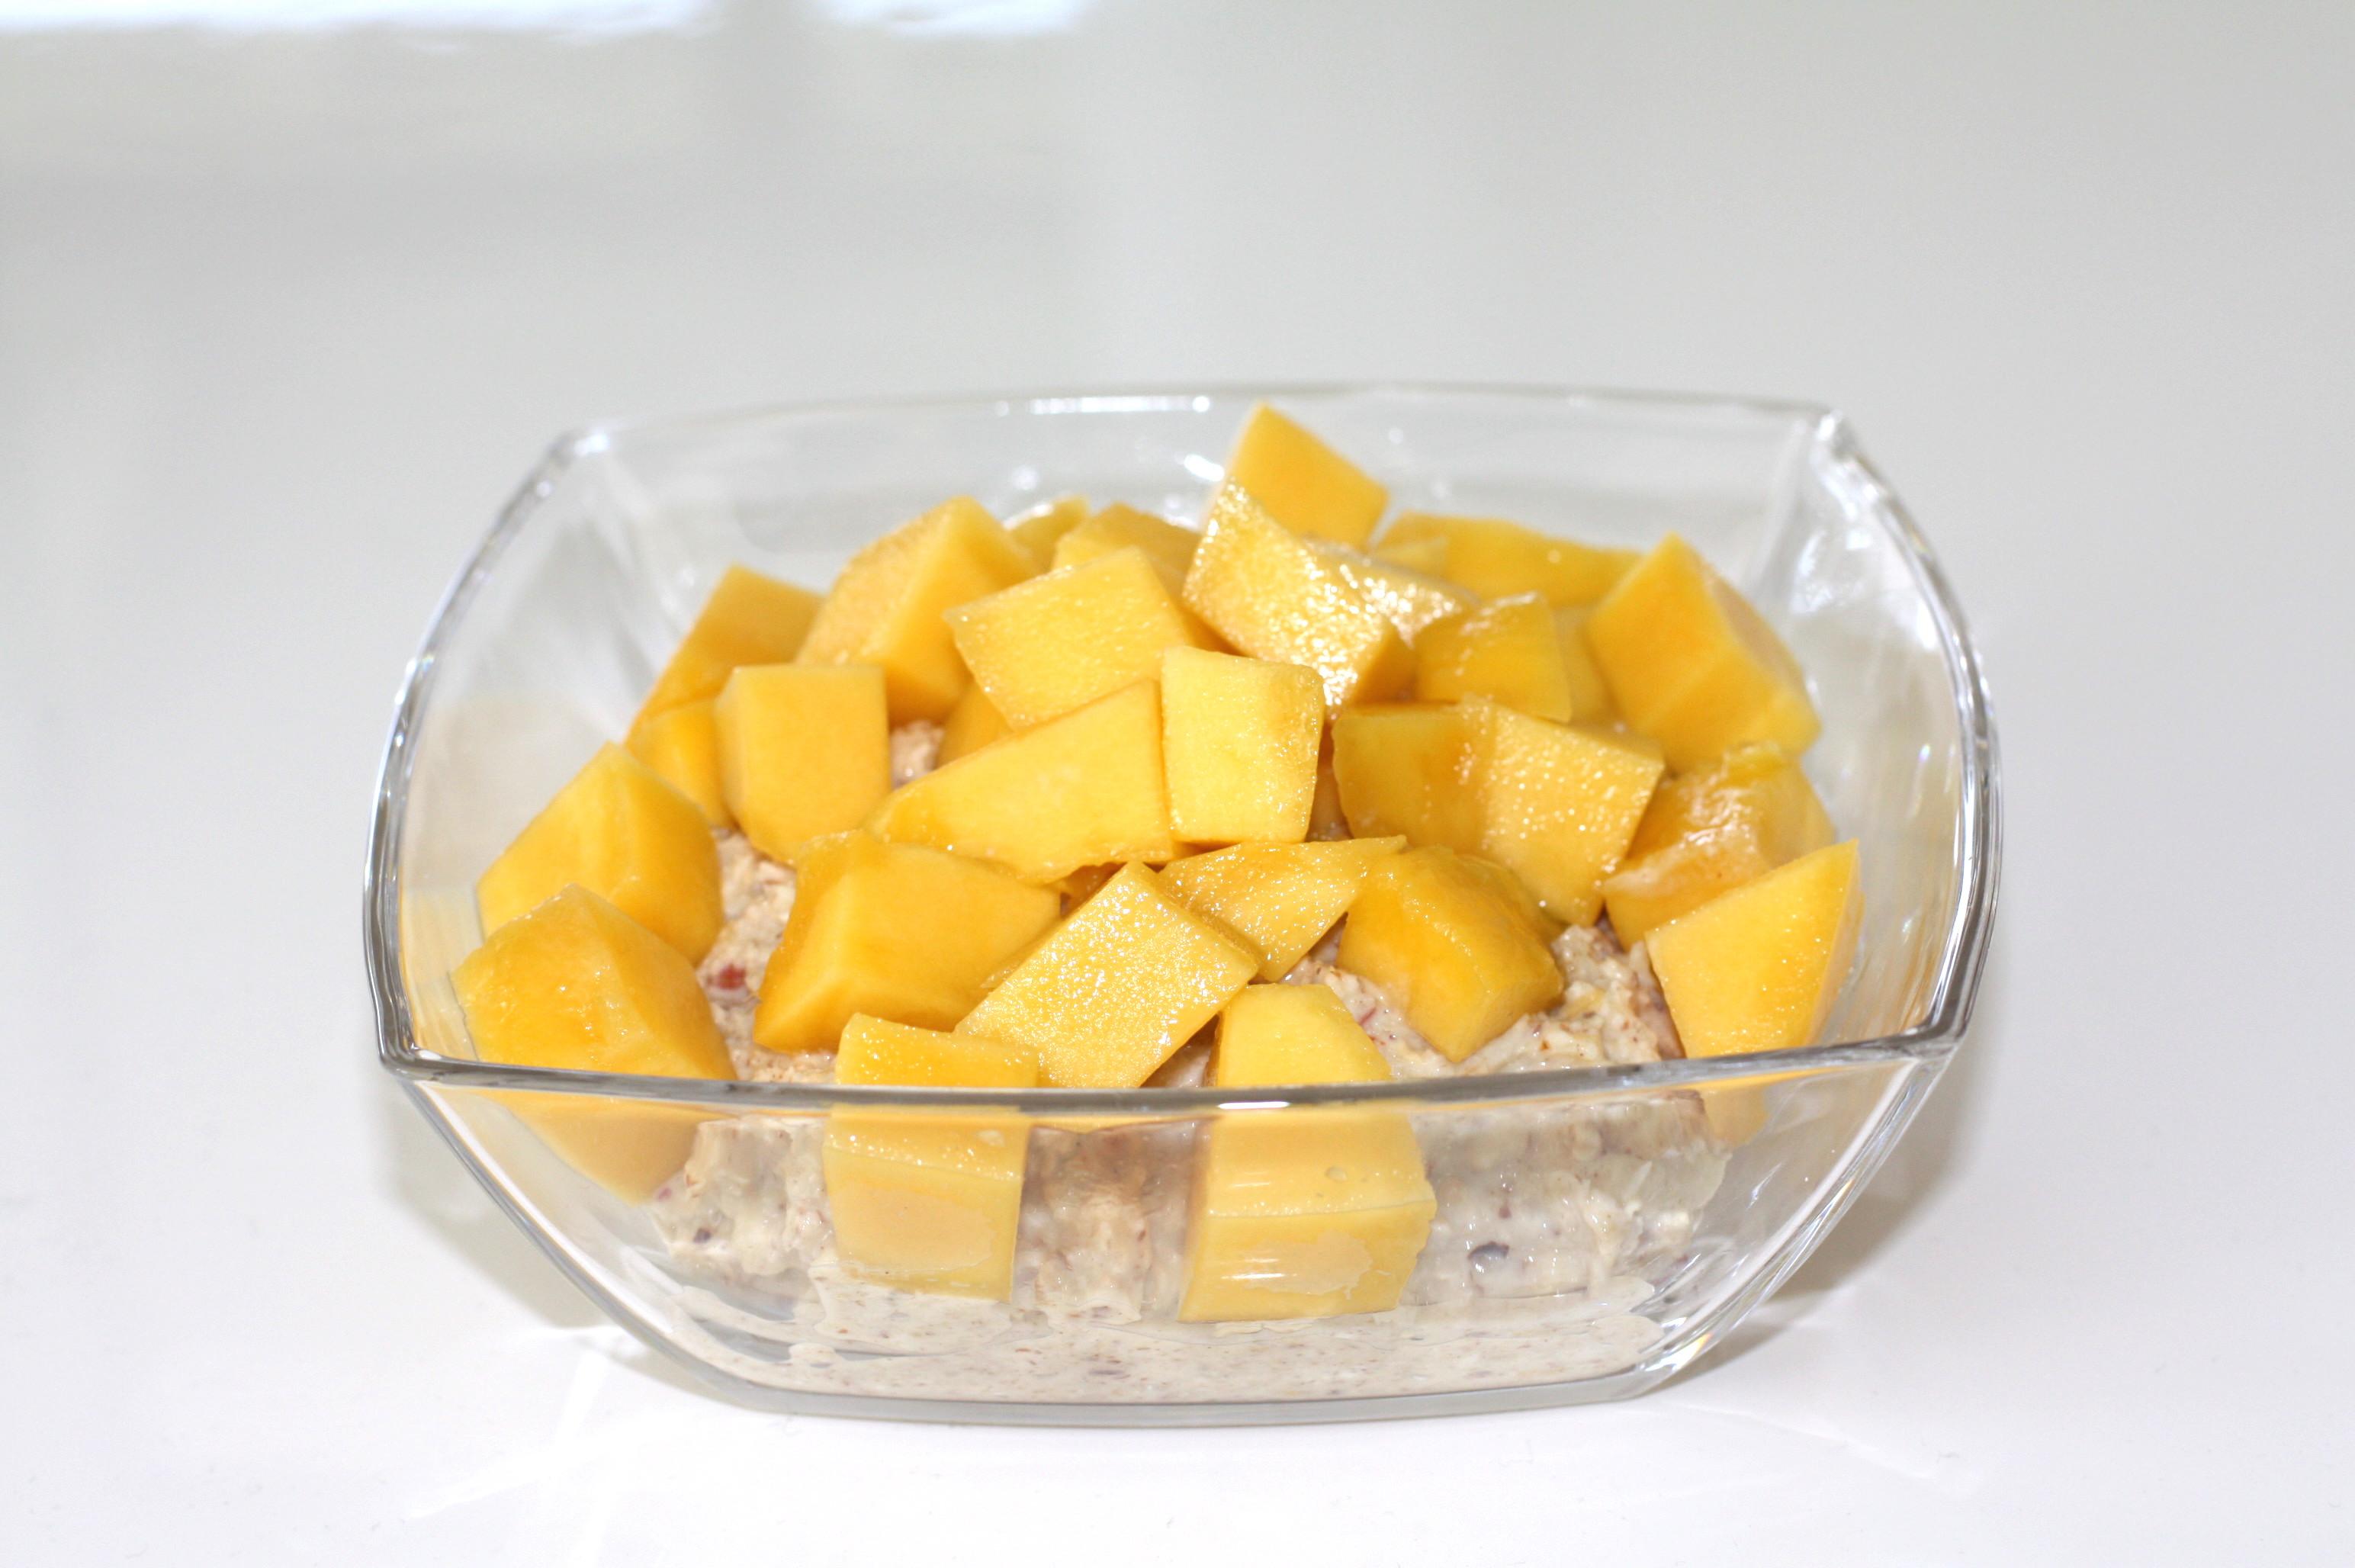 Kokos-Bircher-Müsli mit Mango Topping, Bircher Müsli, Frühstücksmüsli. Müsli